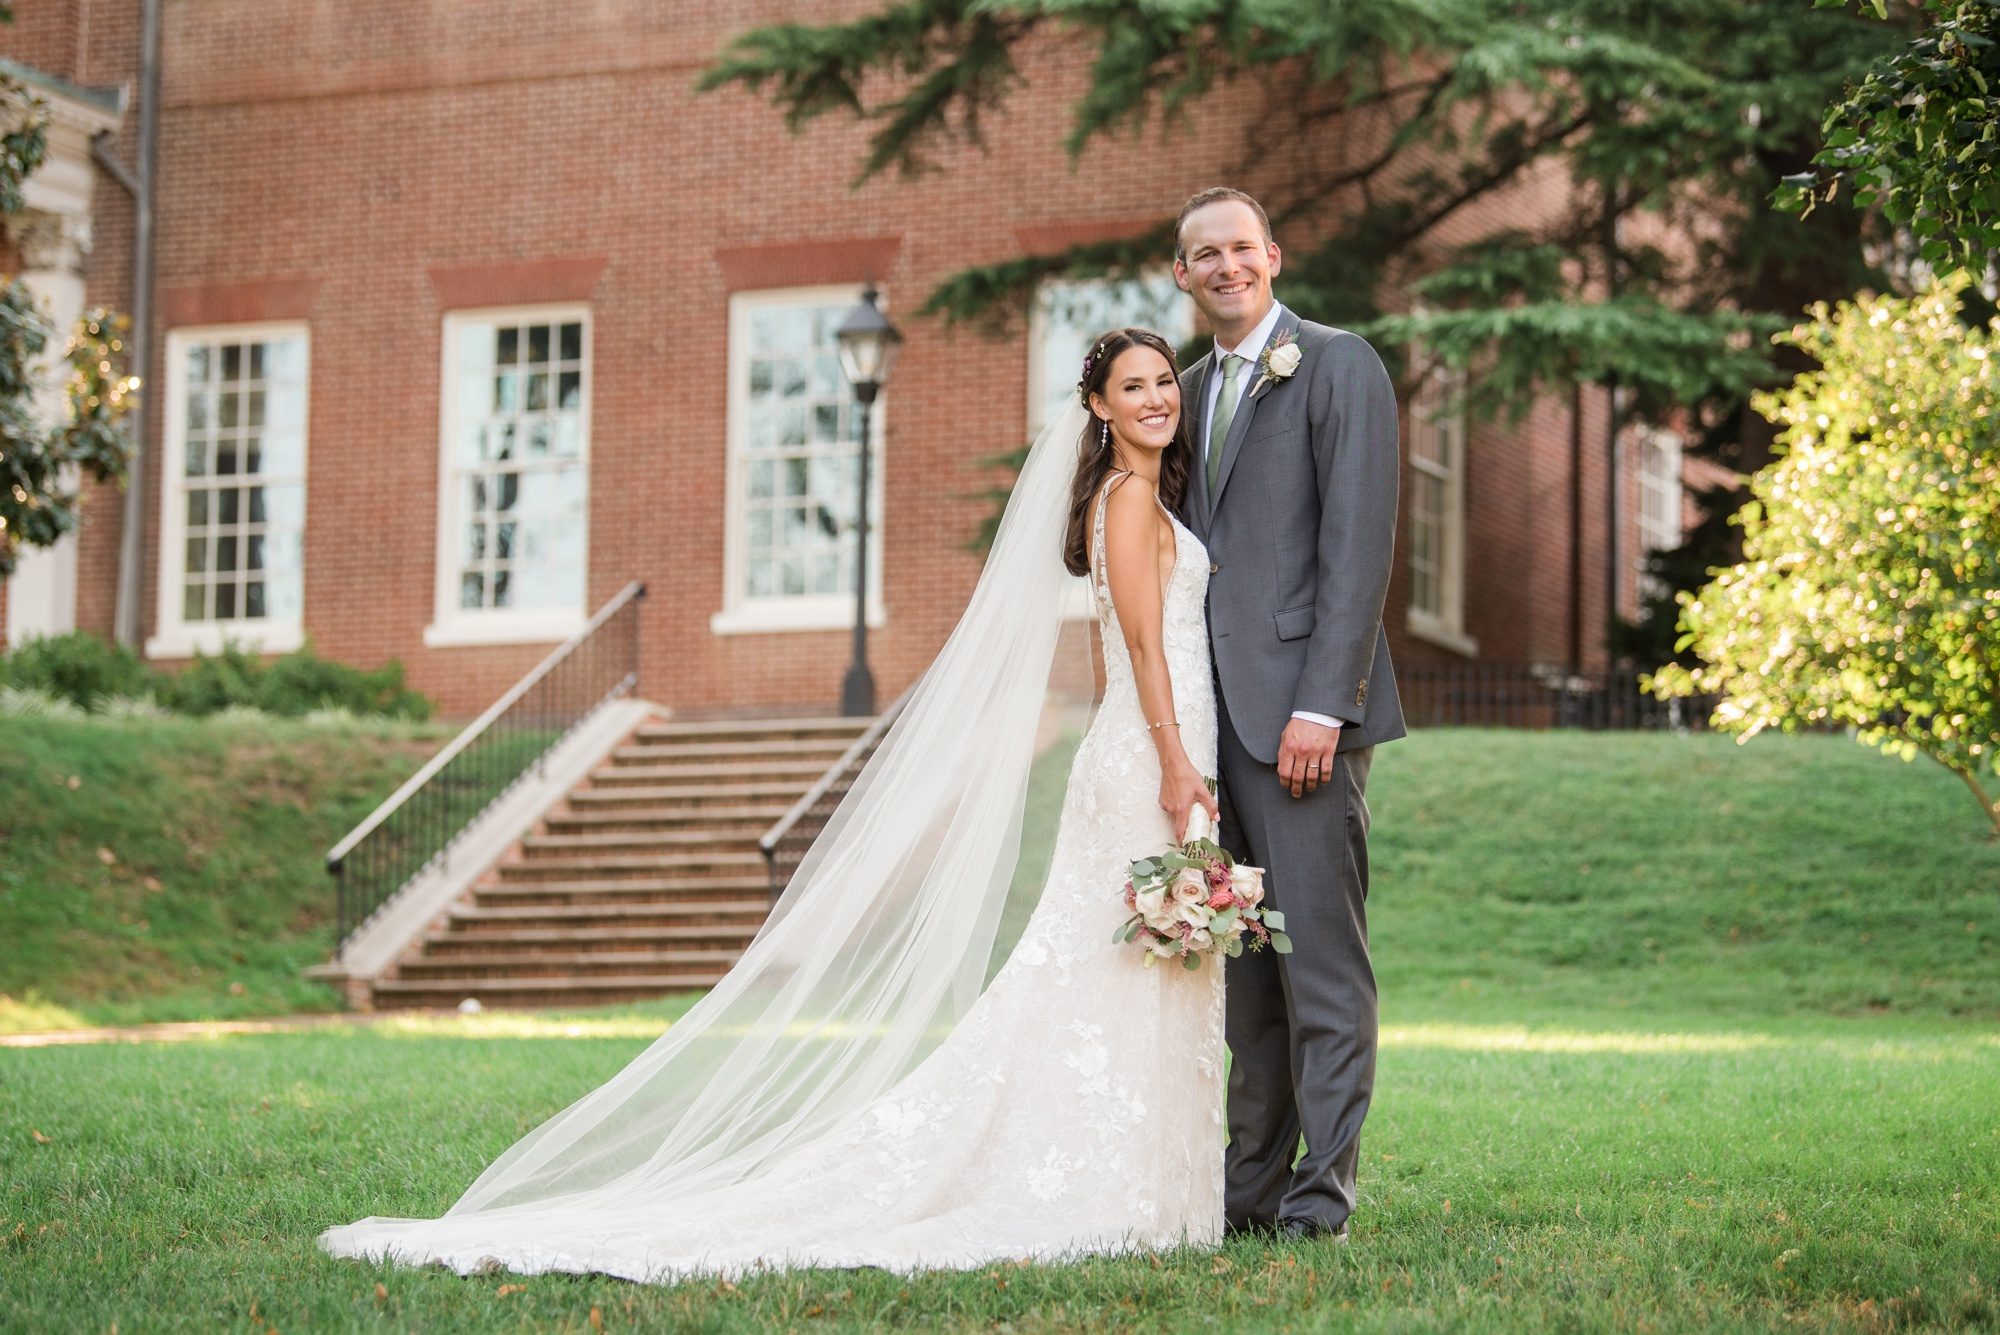 Historic Inns of Annapolis wedding photos